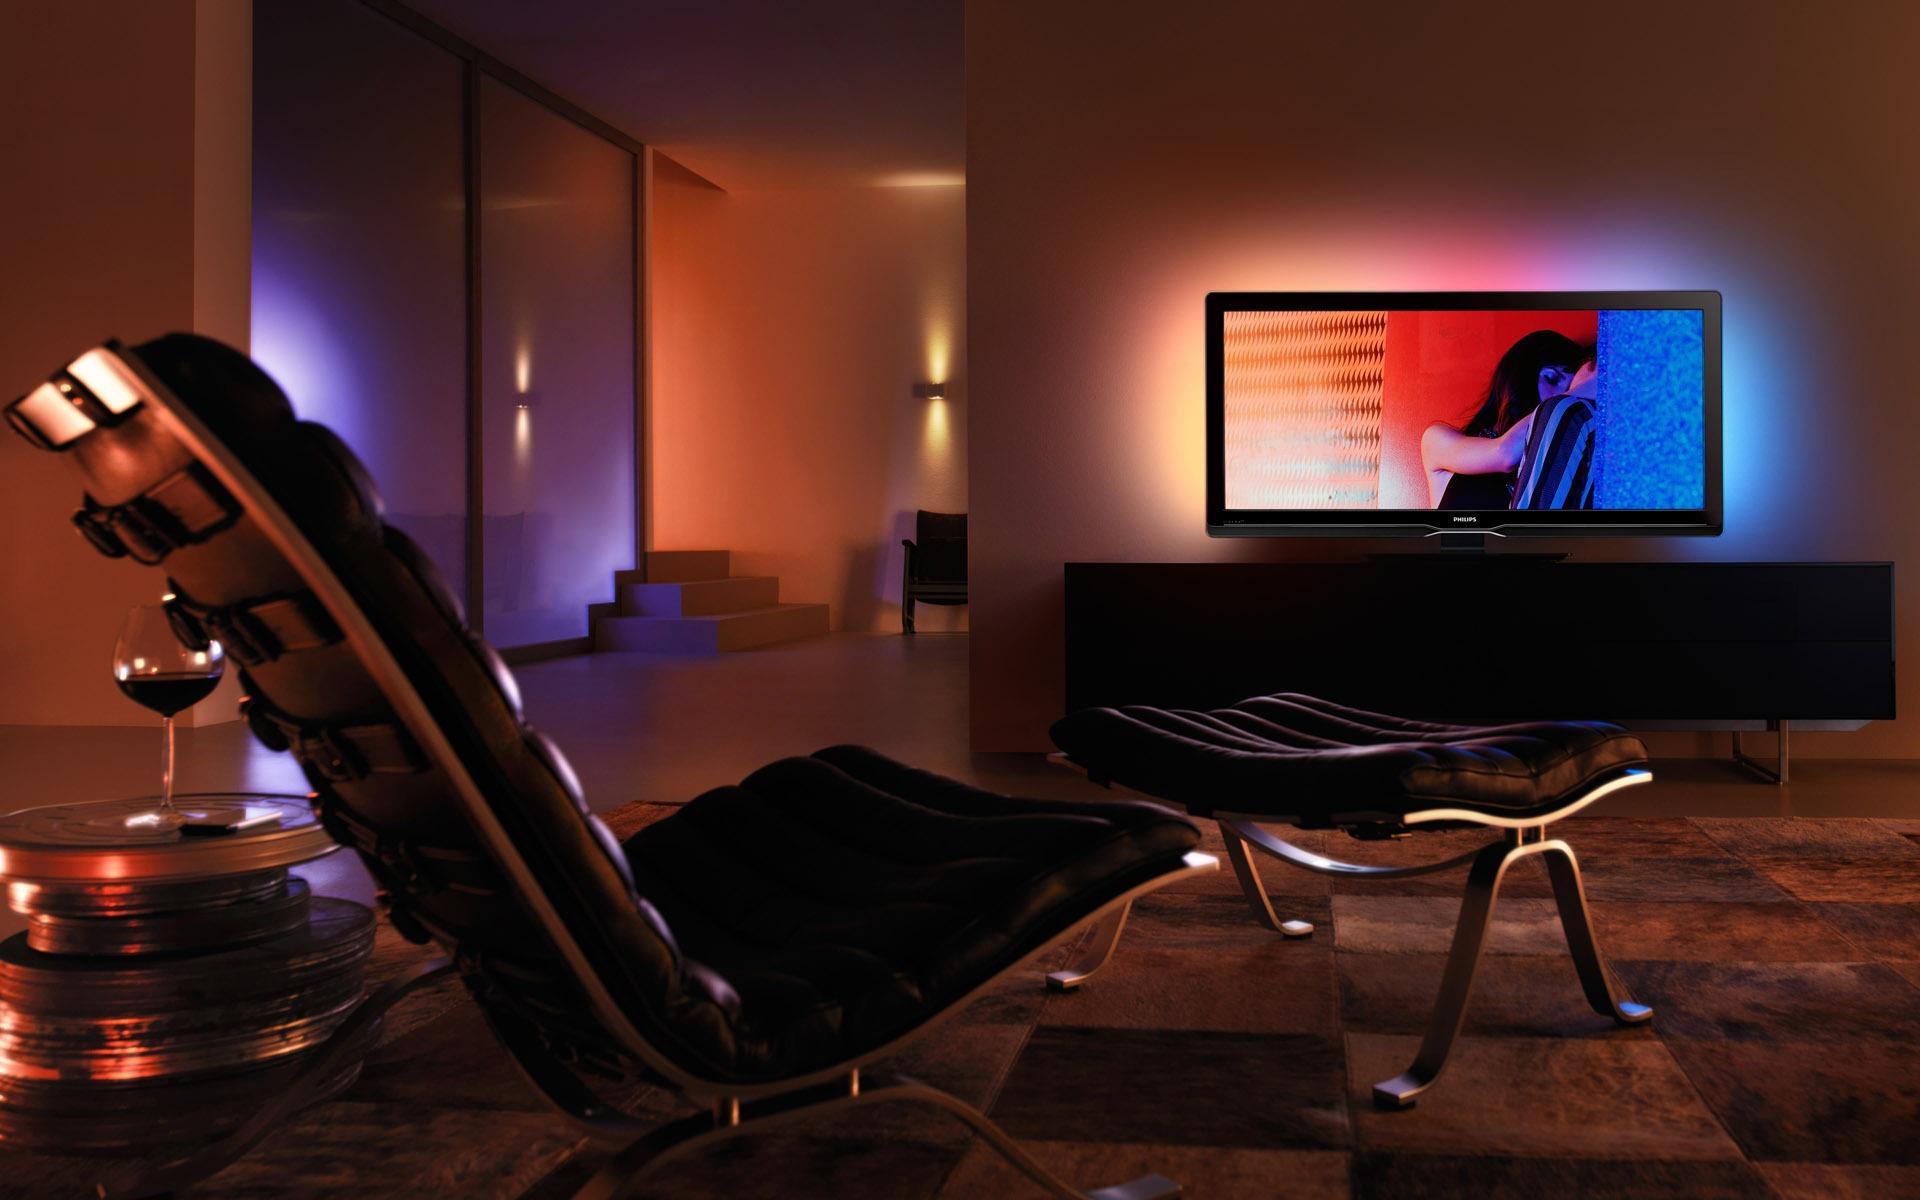 Fondo de pantalla de cine en casa (2) #1 - 1920x1200 Fondos de ...